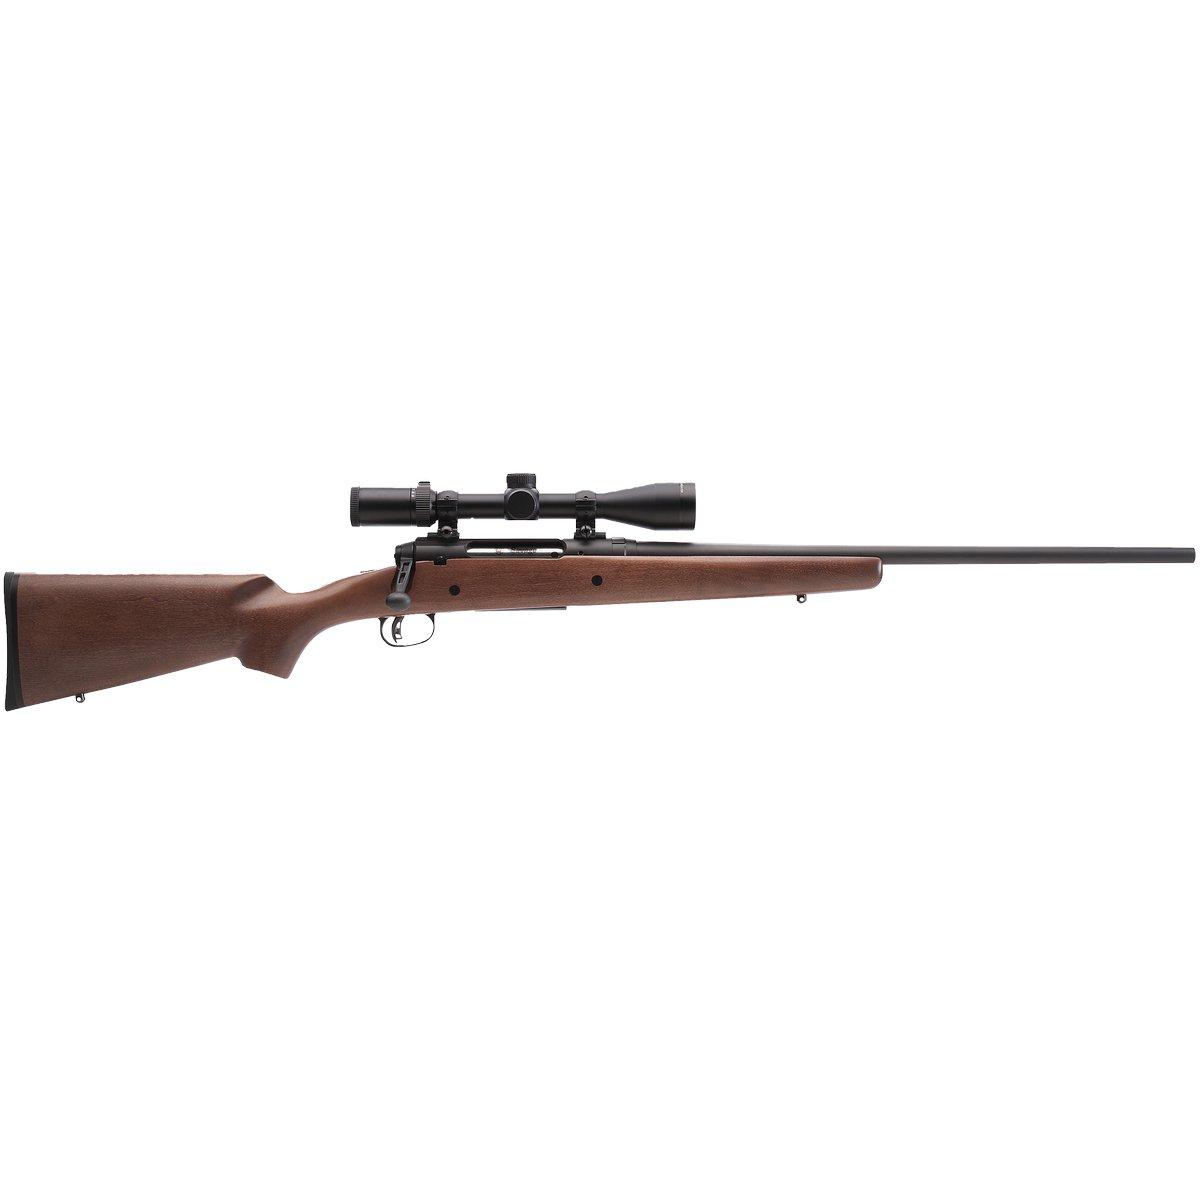 Savage Axis II XP Hardwood Centerfire Rifle Package, .22-250 Rem.